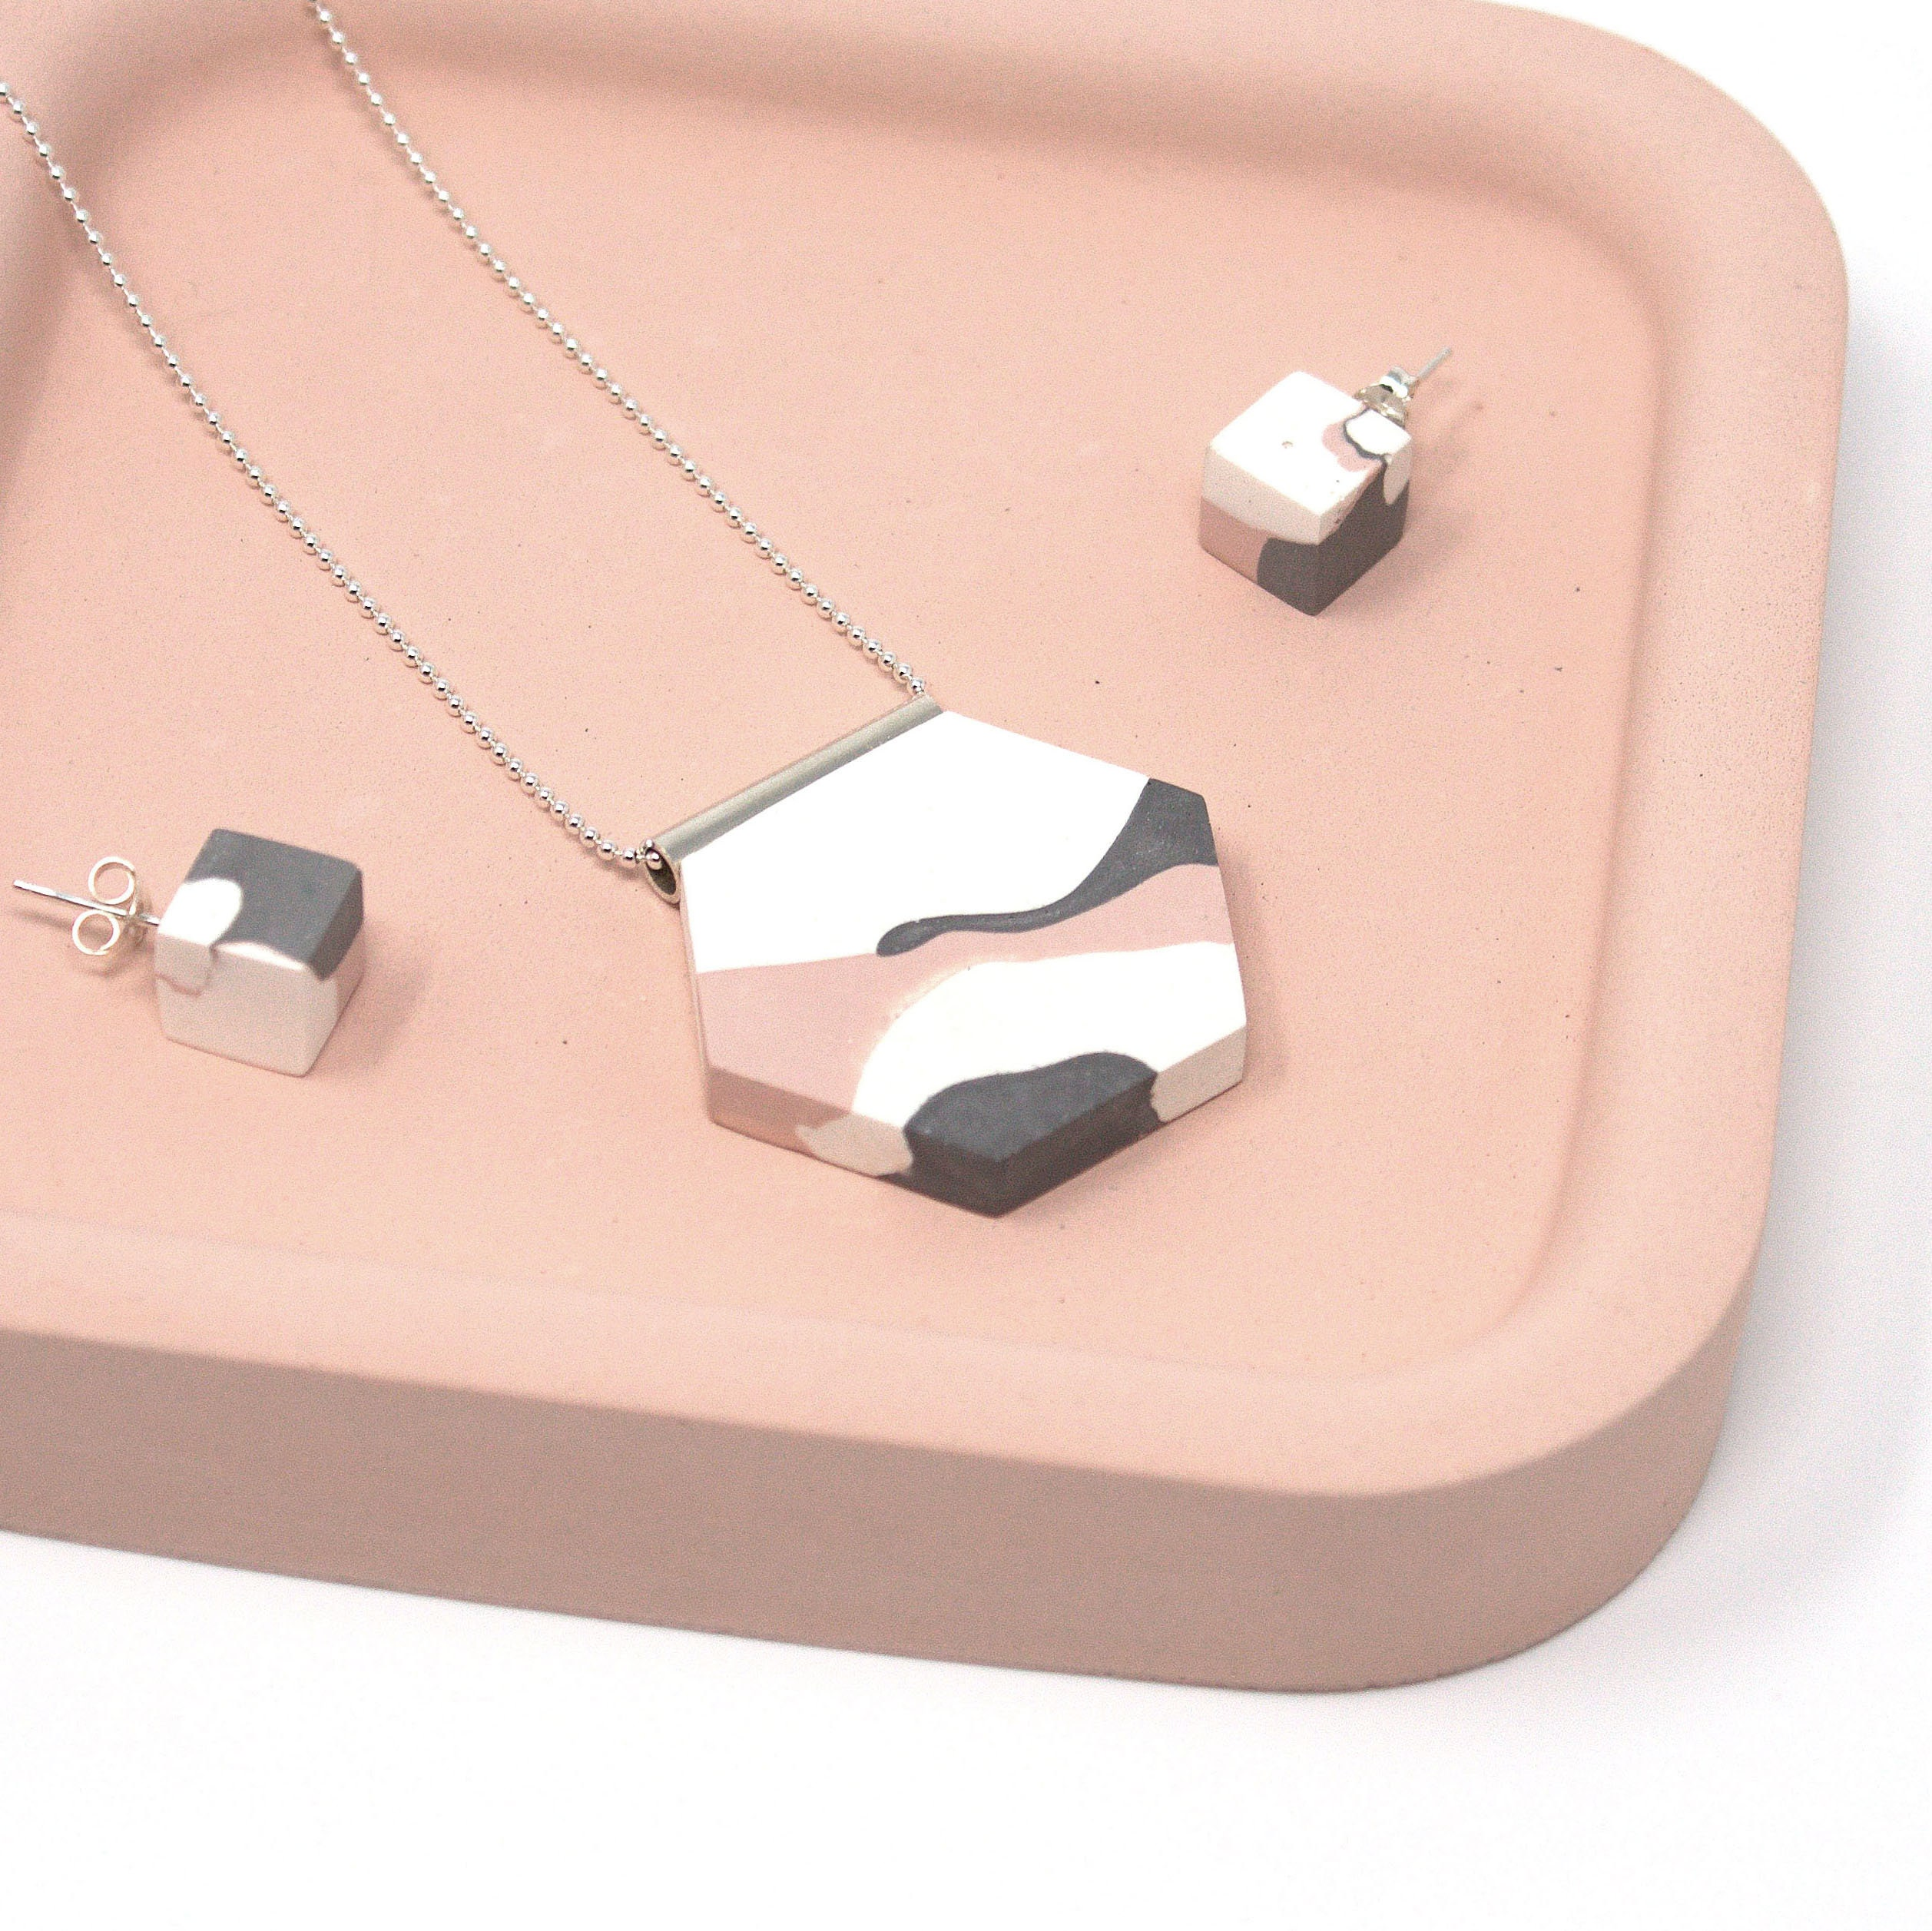 Green Lucky Charm concrete pendant necklace conceptual jewellery minimalist jewellery brutalist jewellery geometric jewellery